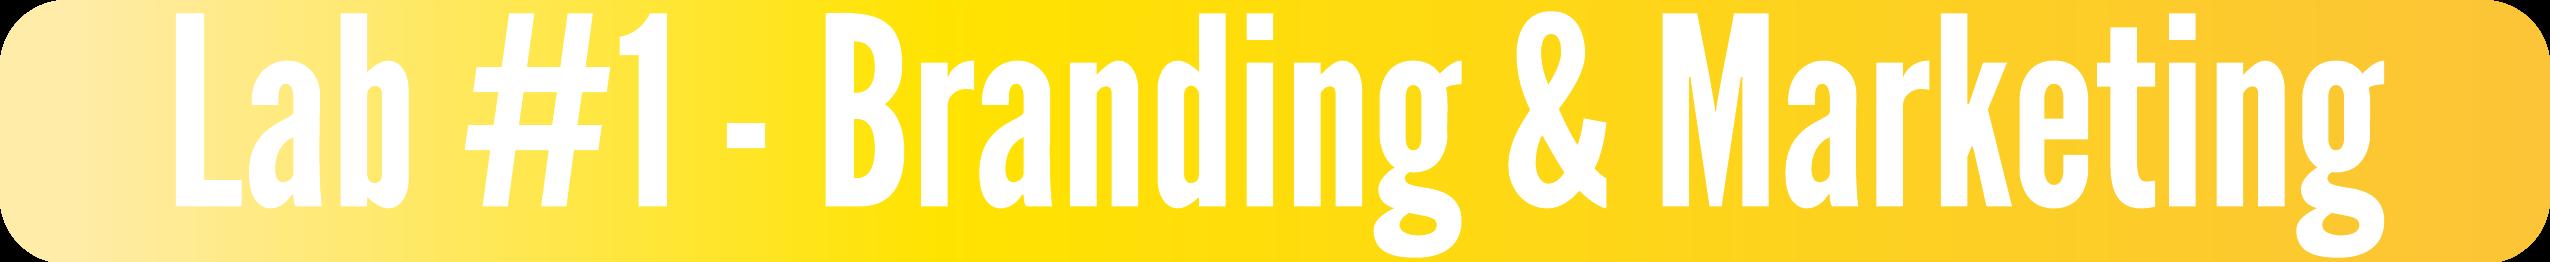 Lab #1 - Branding & Marketing